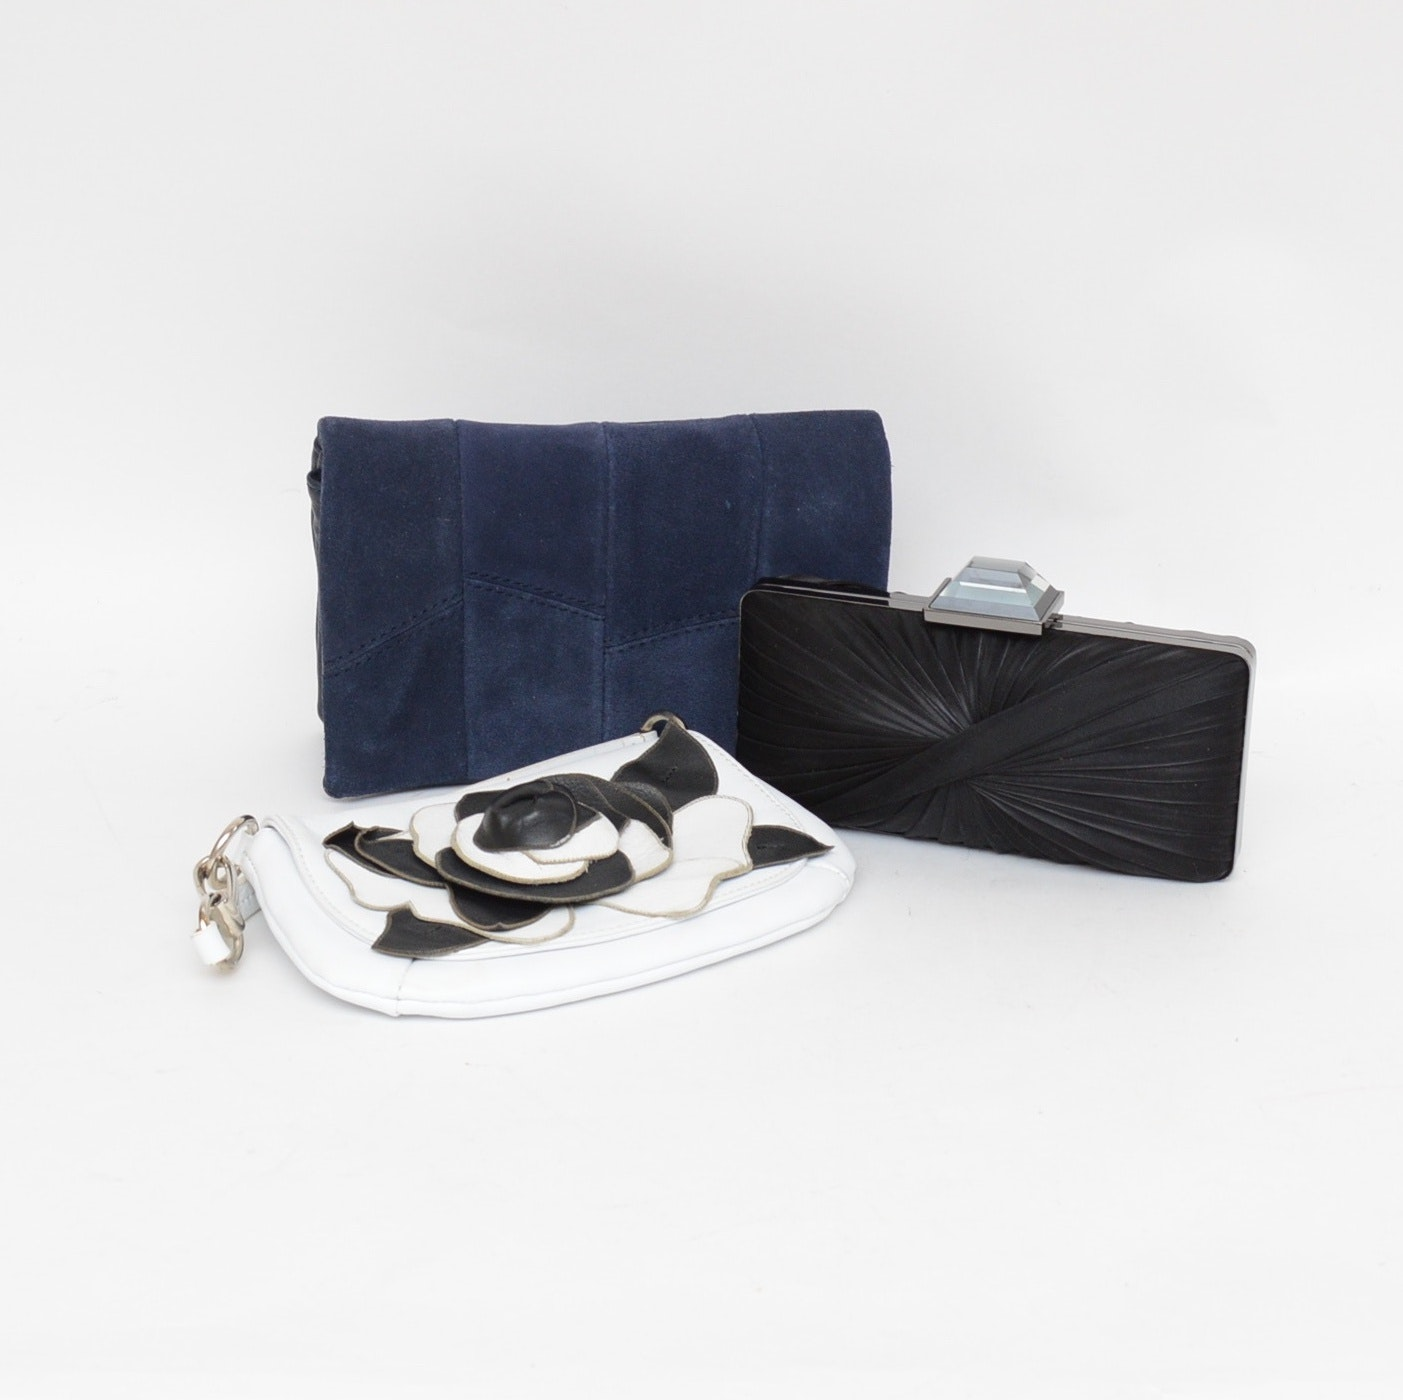 Couture Donald J Pliner, Sondra Roberts and Street Level Handbags